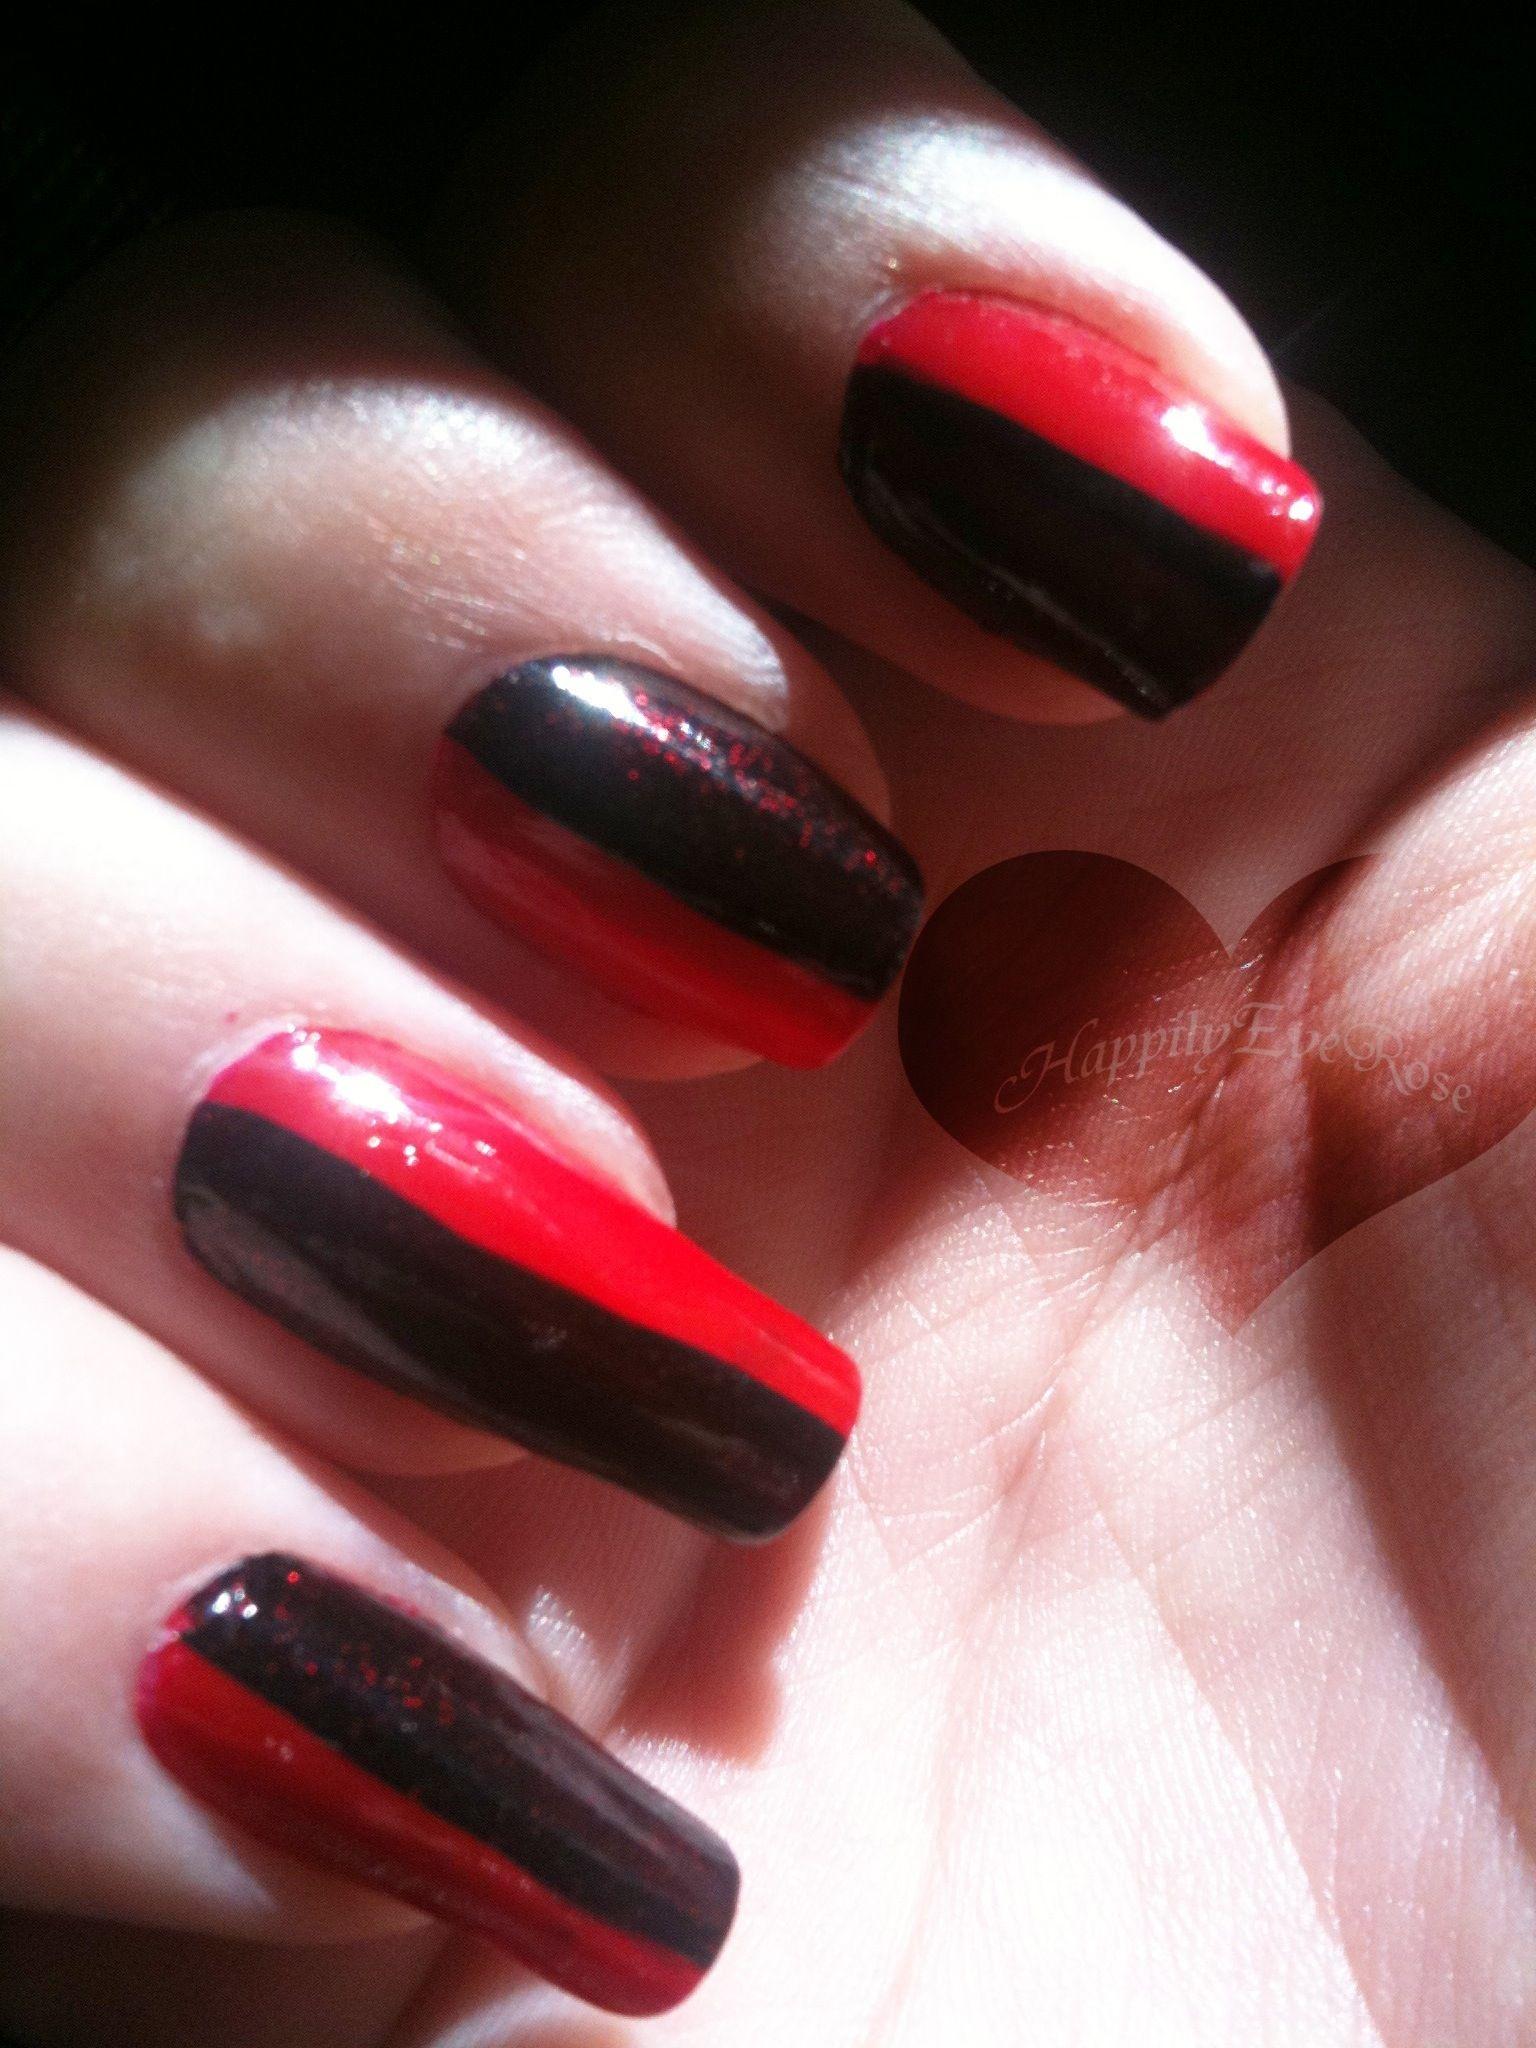 Dark black & red nail design | Nails | Pinterest | Red nail designs ...